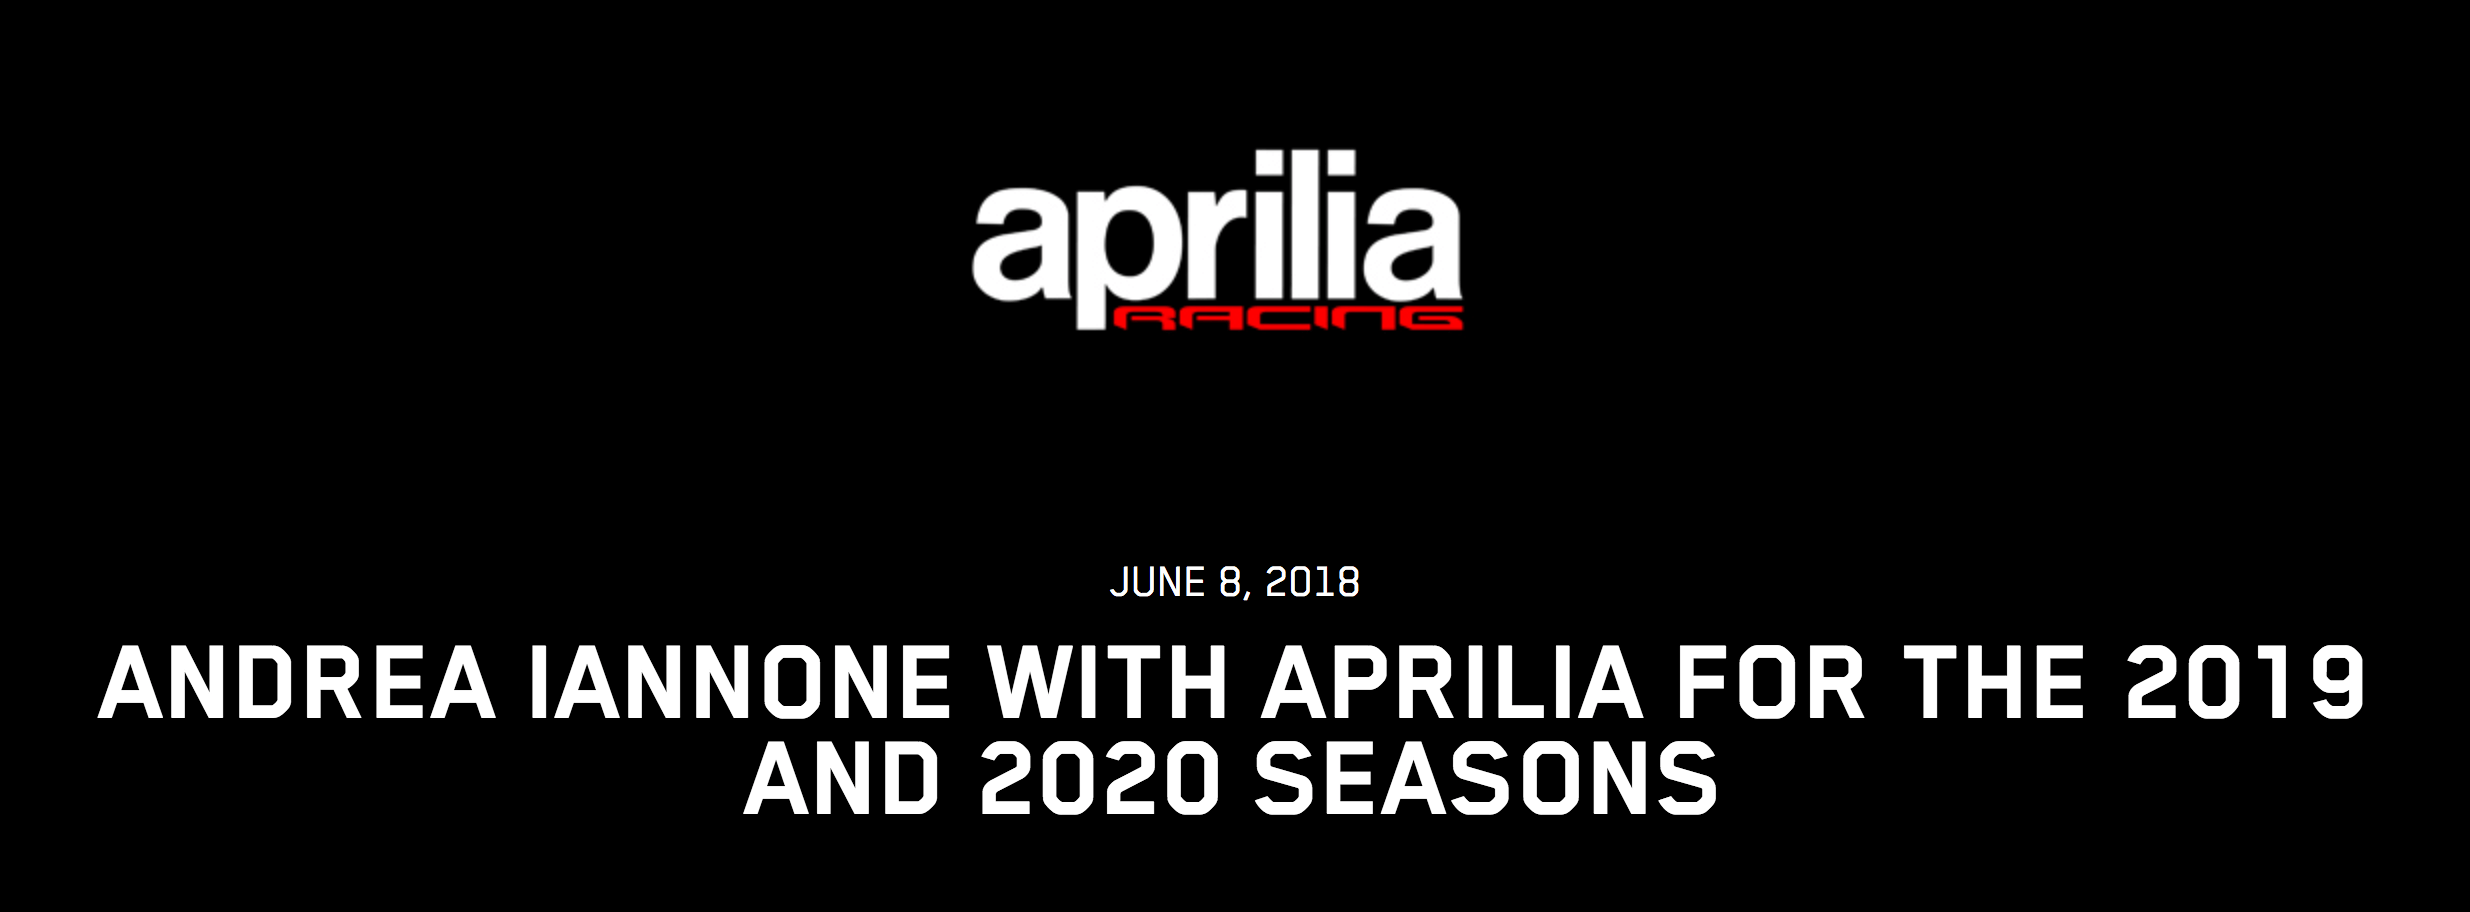 ★MotoGP2018 アプリリア アンドレア・イアンノーネとの2年契約を発表